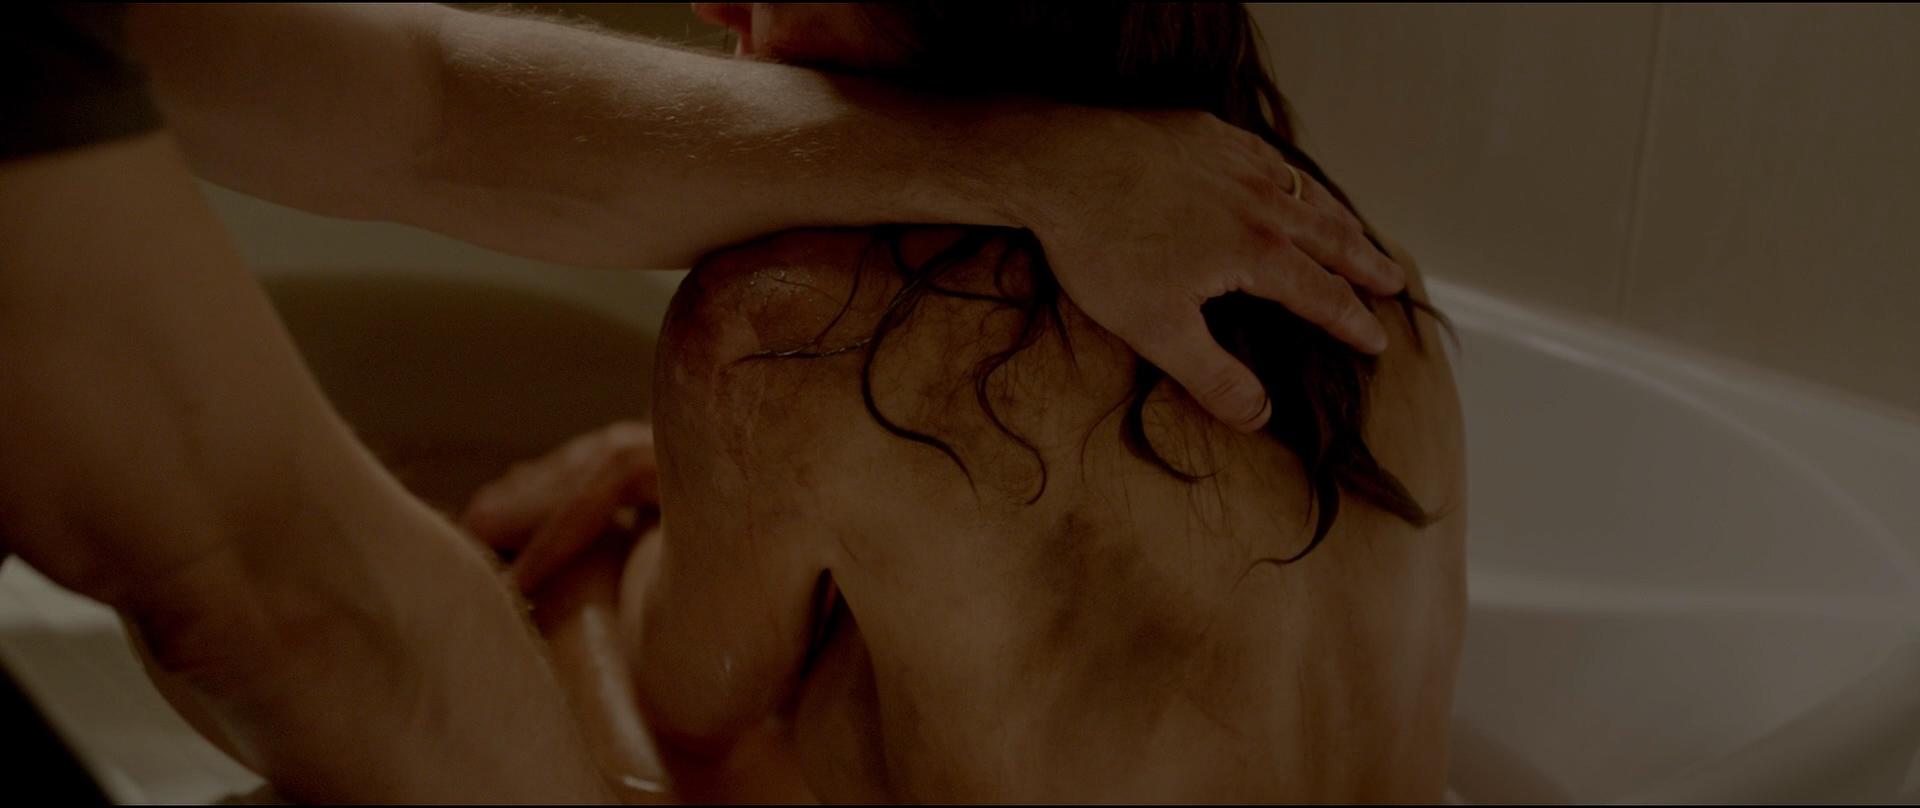 Nicole Kidman nude full frontal or bd and Madisson Brown hot - Strangerland (2015) hd1080p BluRay (14)